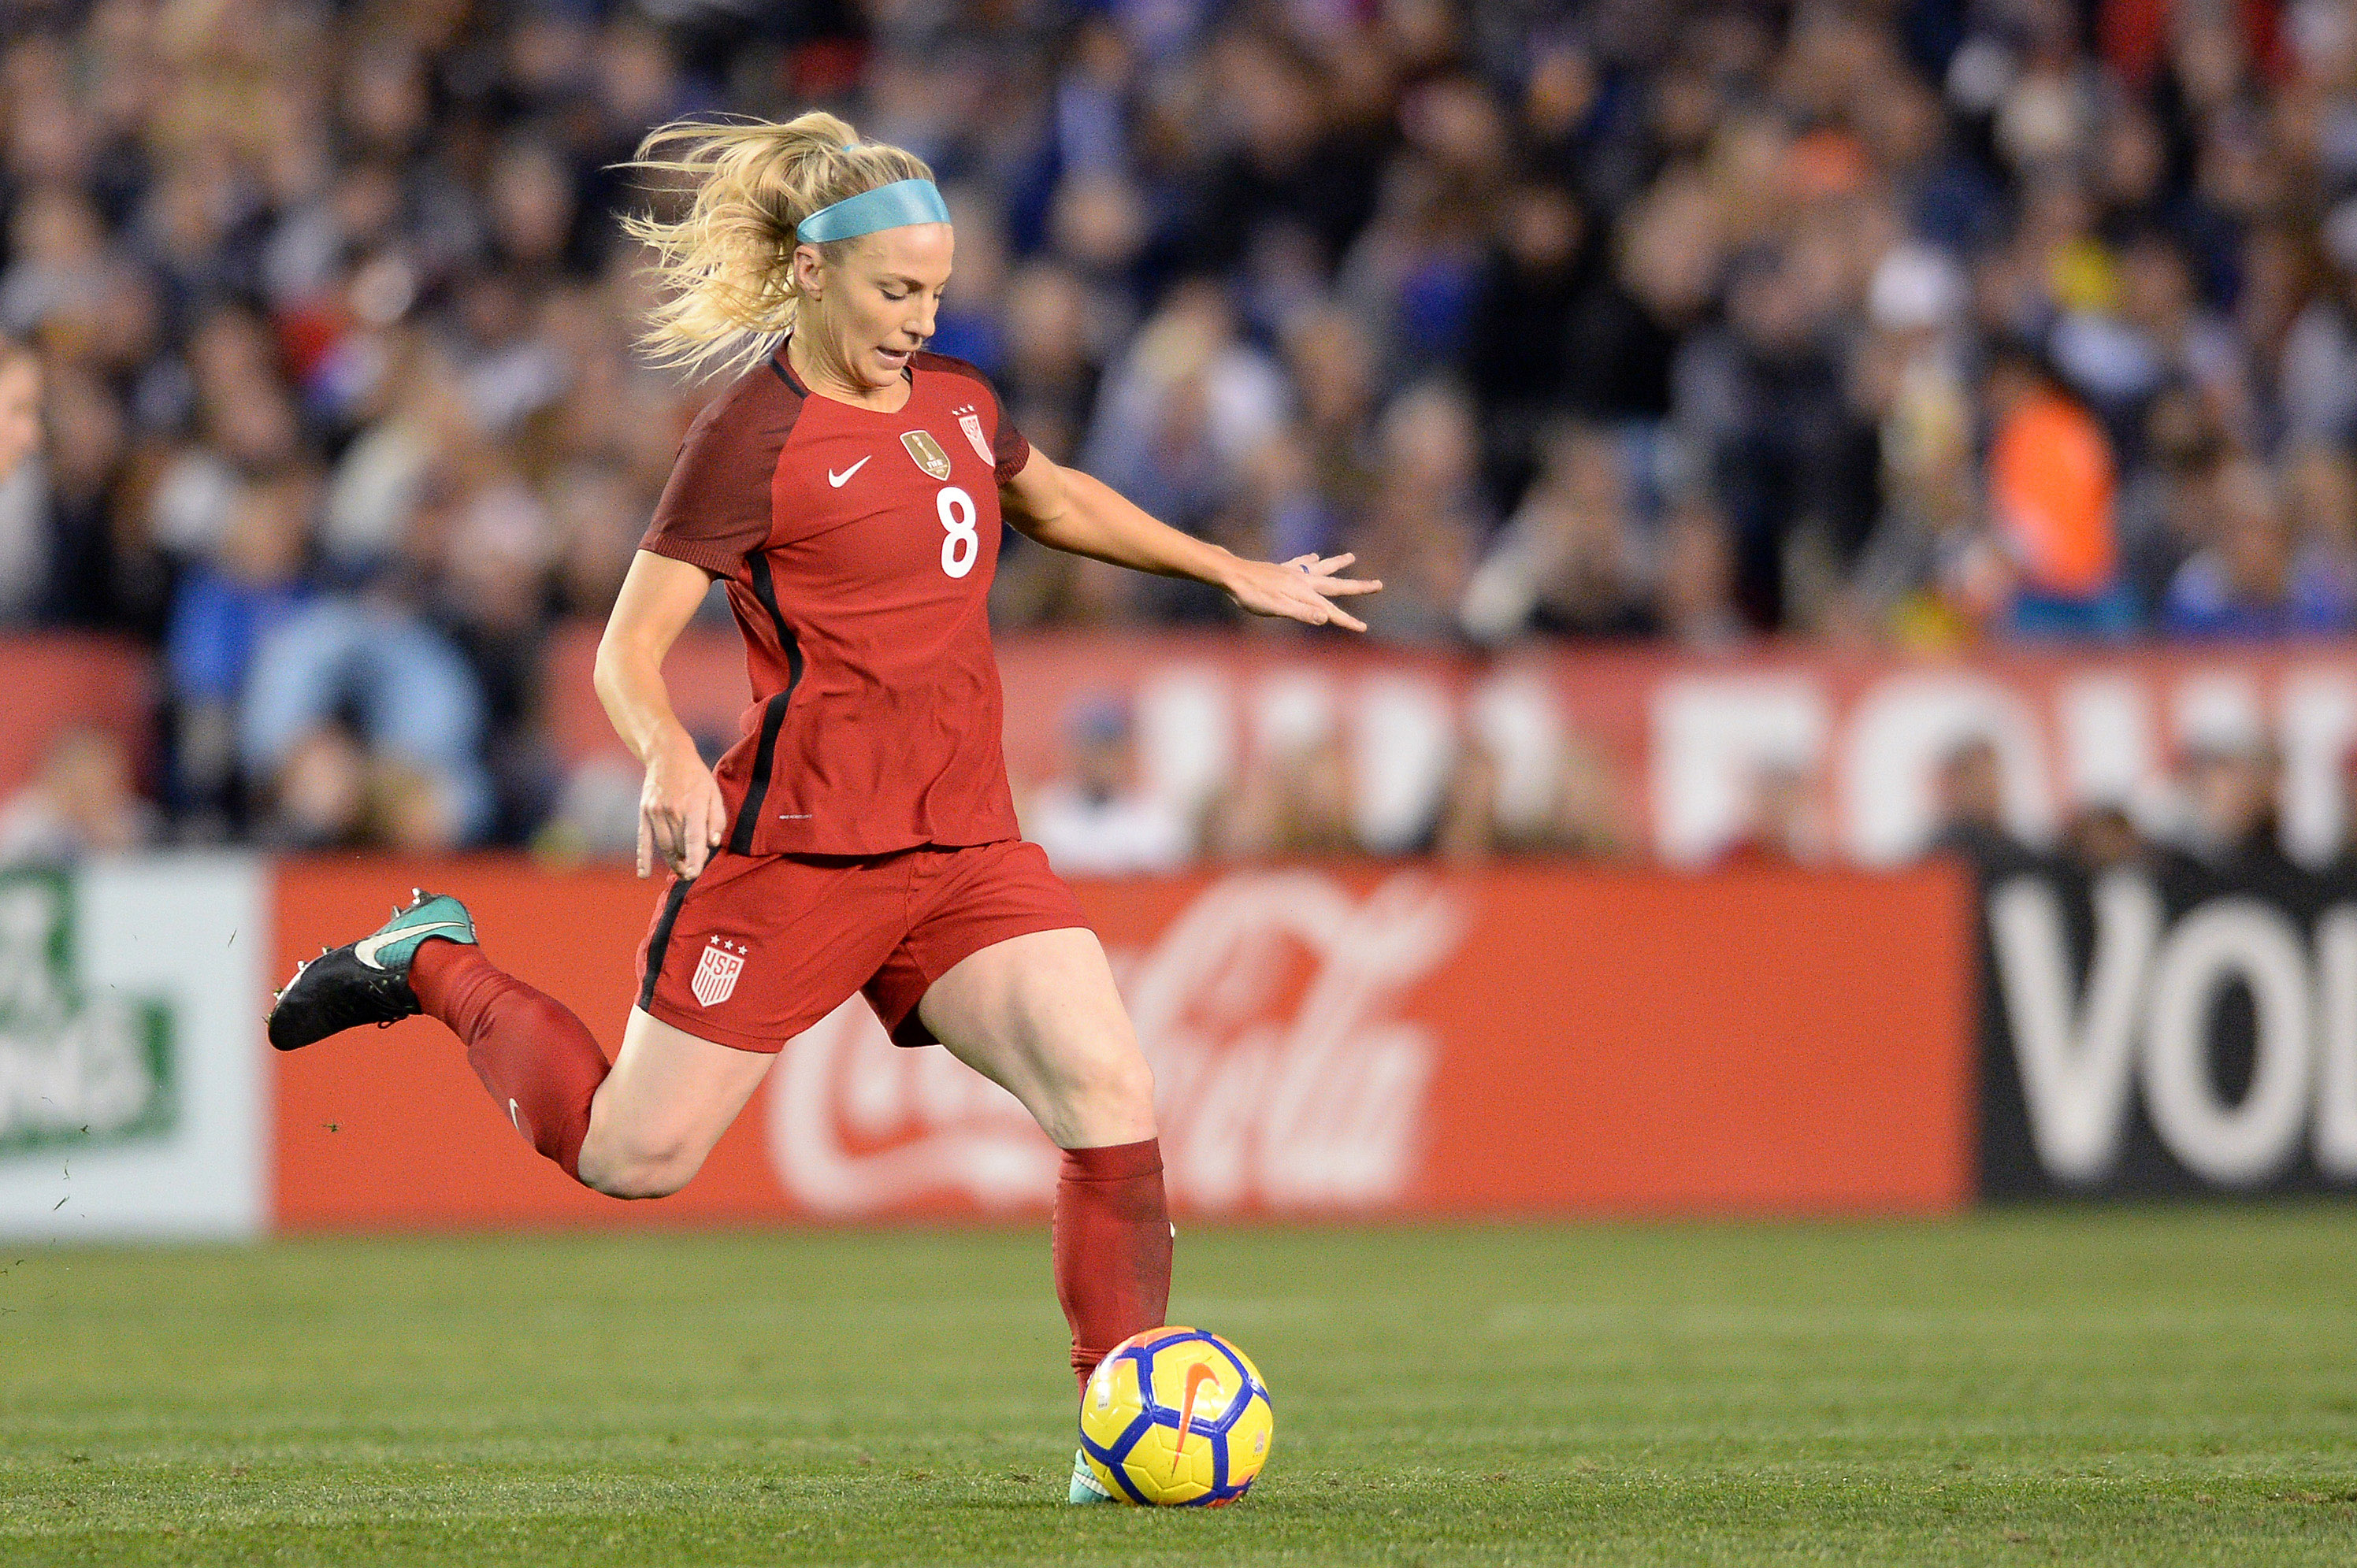 Soccer: International Friendly Women's Soccer-Denmark at U.S.A.